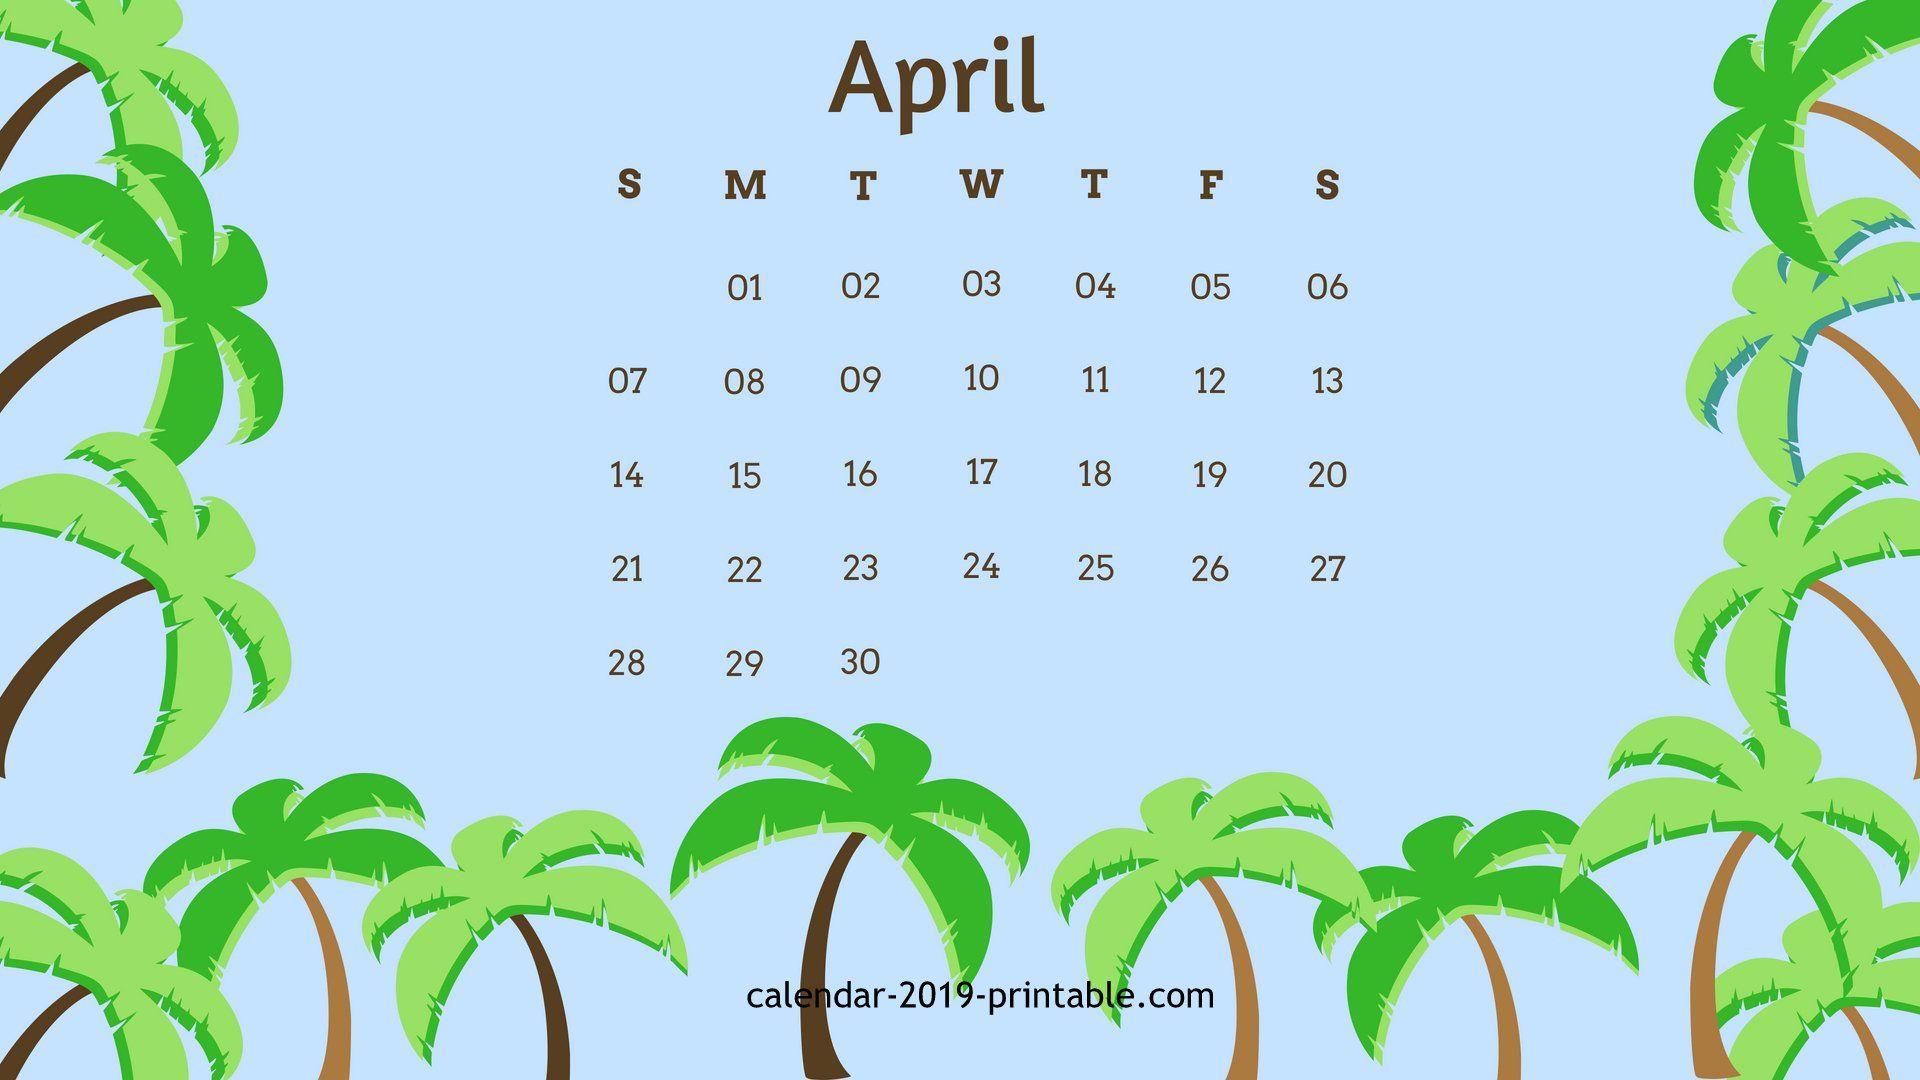 free april 2019 wallpaper calendar 2019 Calendars Pinterest 1920x1080